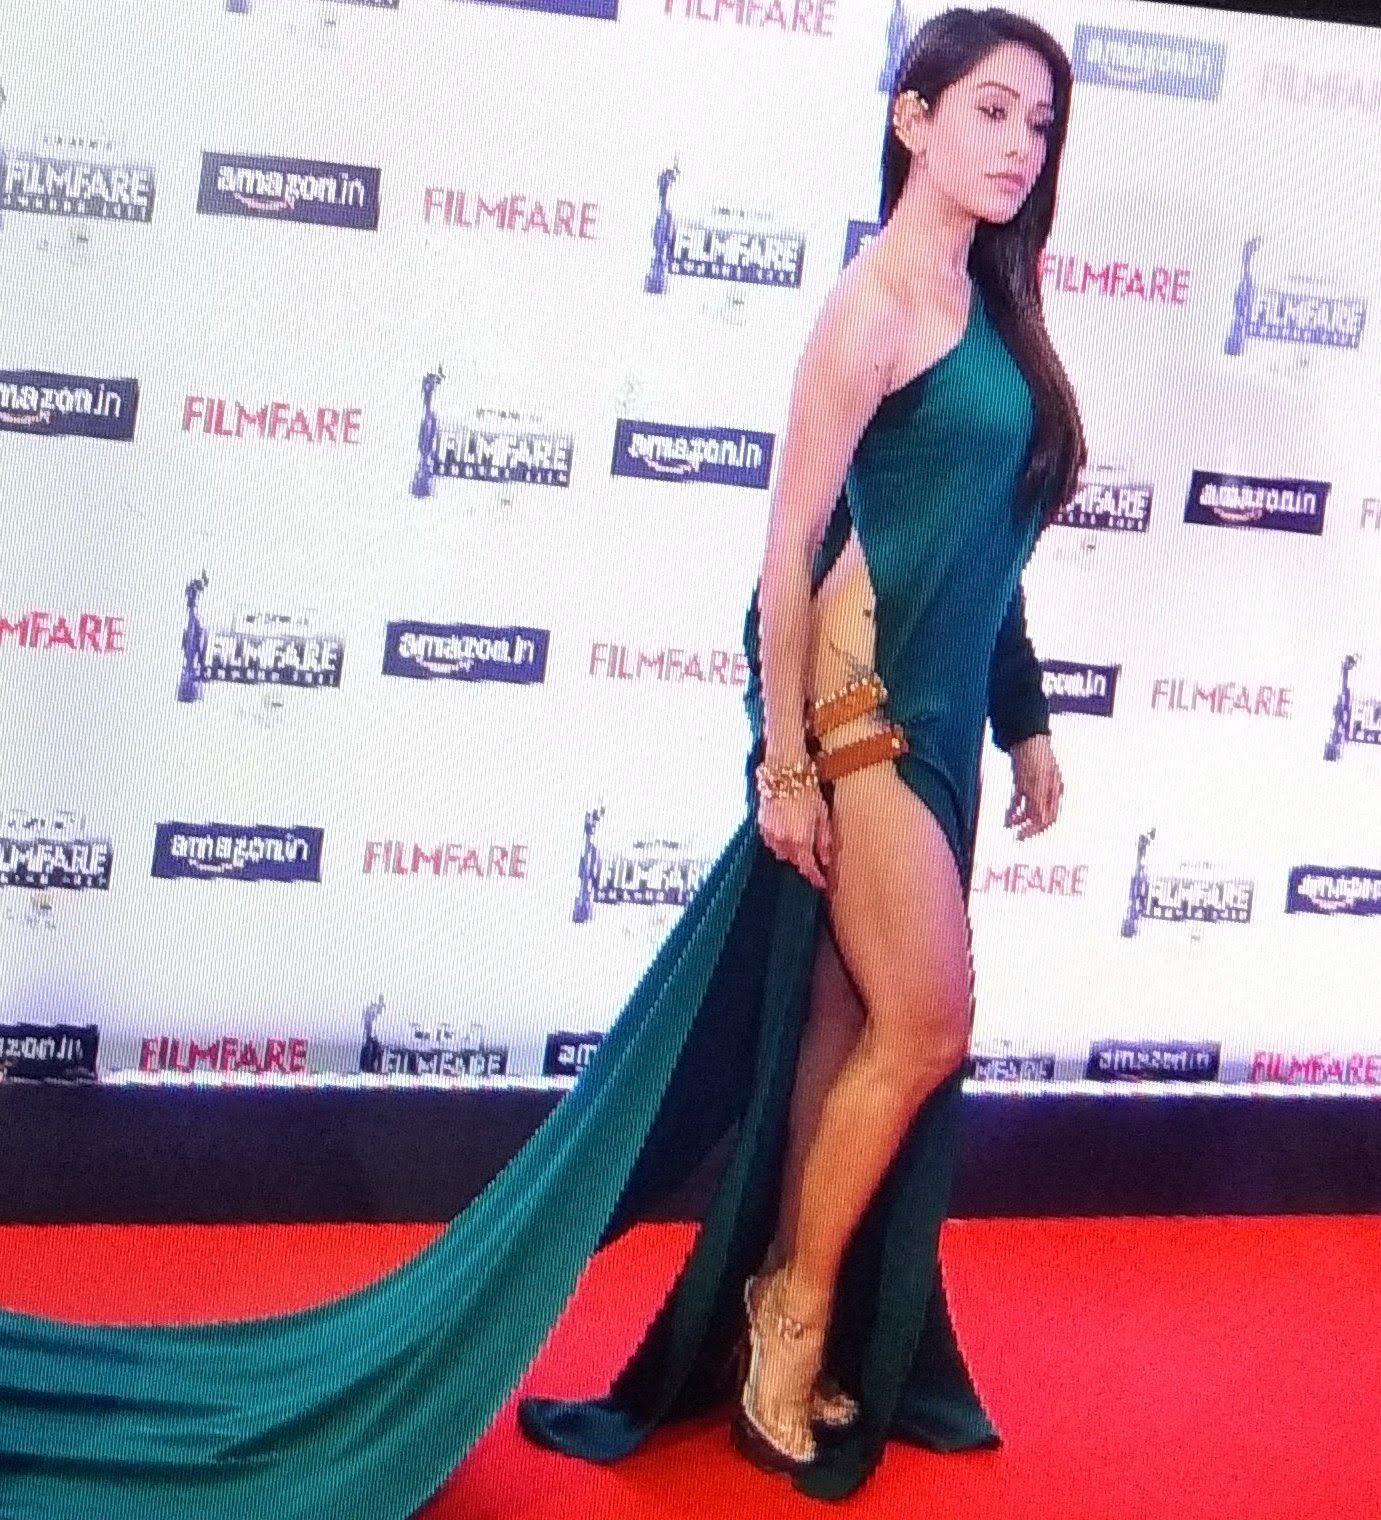 filmfare-awards-2020-2